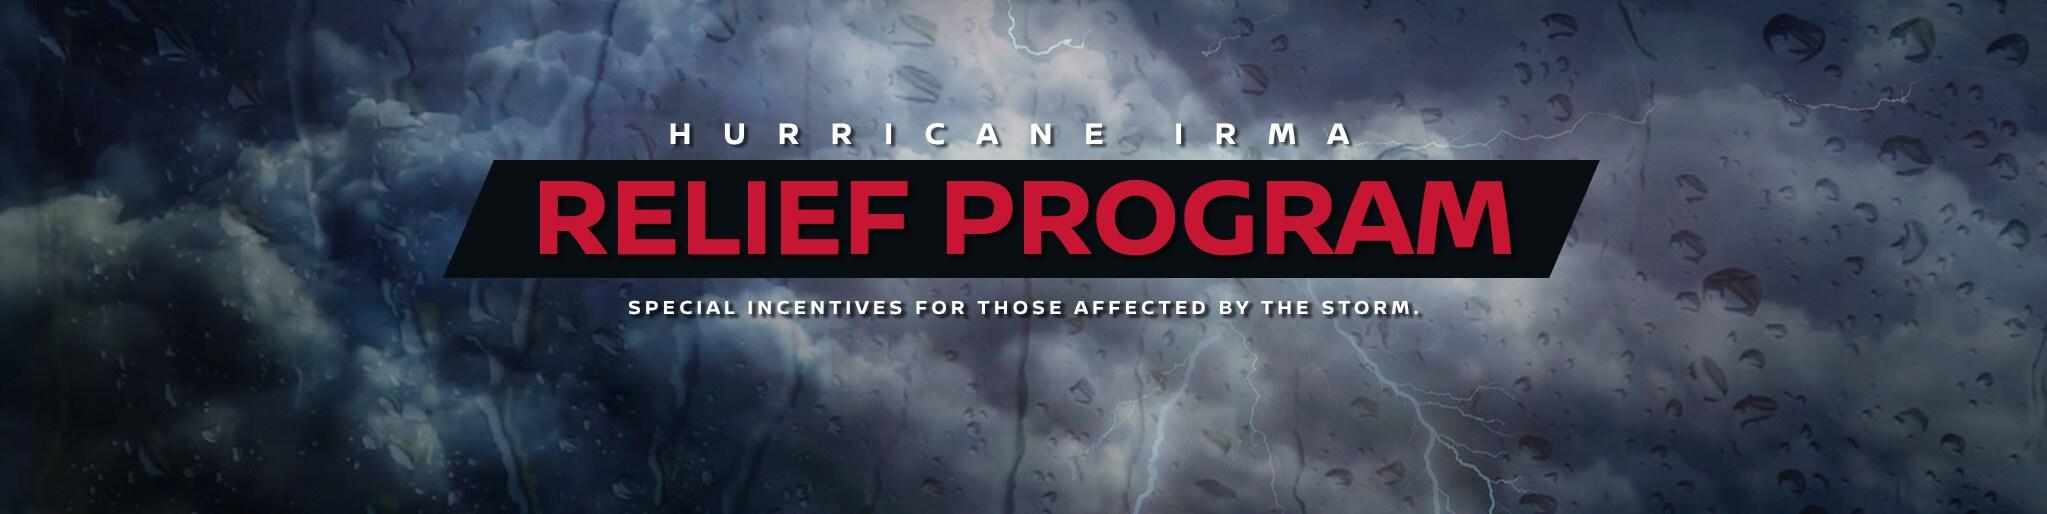 Nissan Hurricane Irma Relief Program